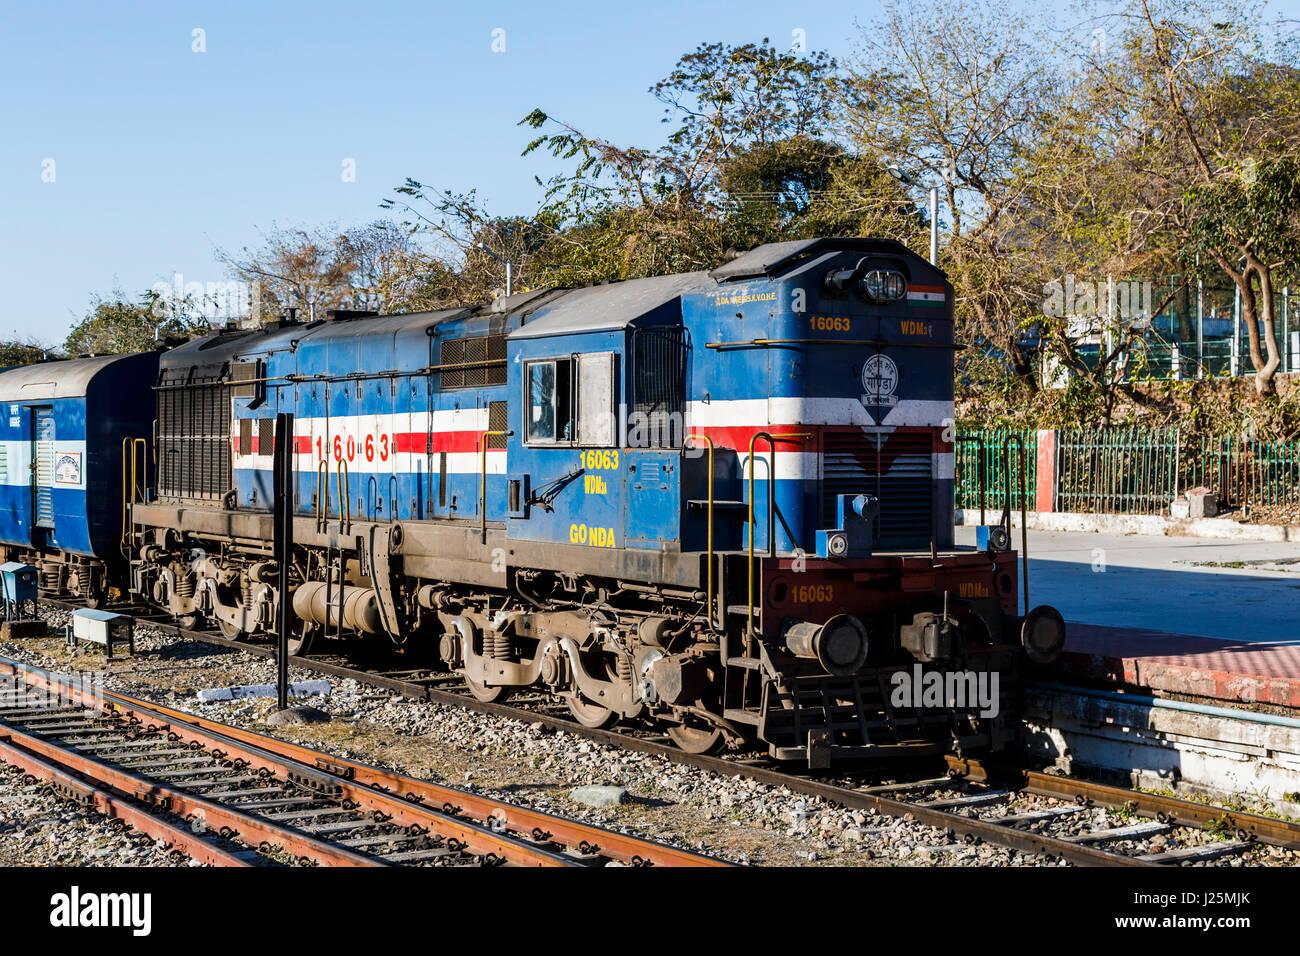 stationary indian railways blue diesel locomotive train engine